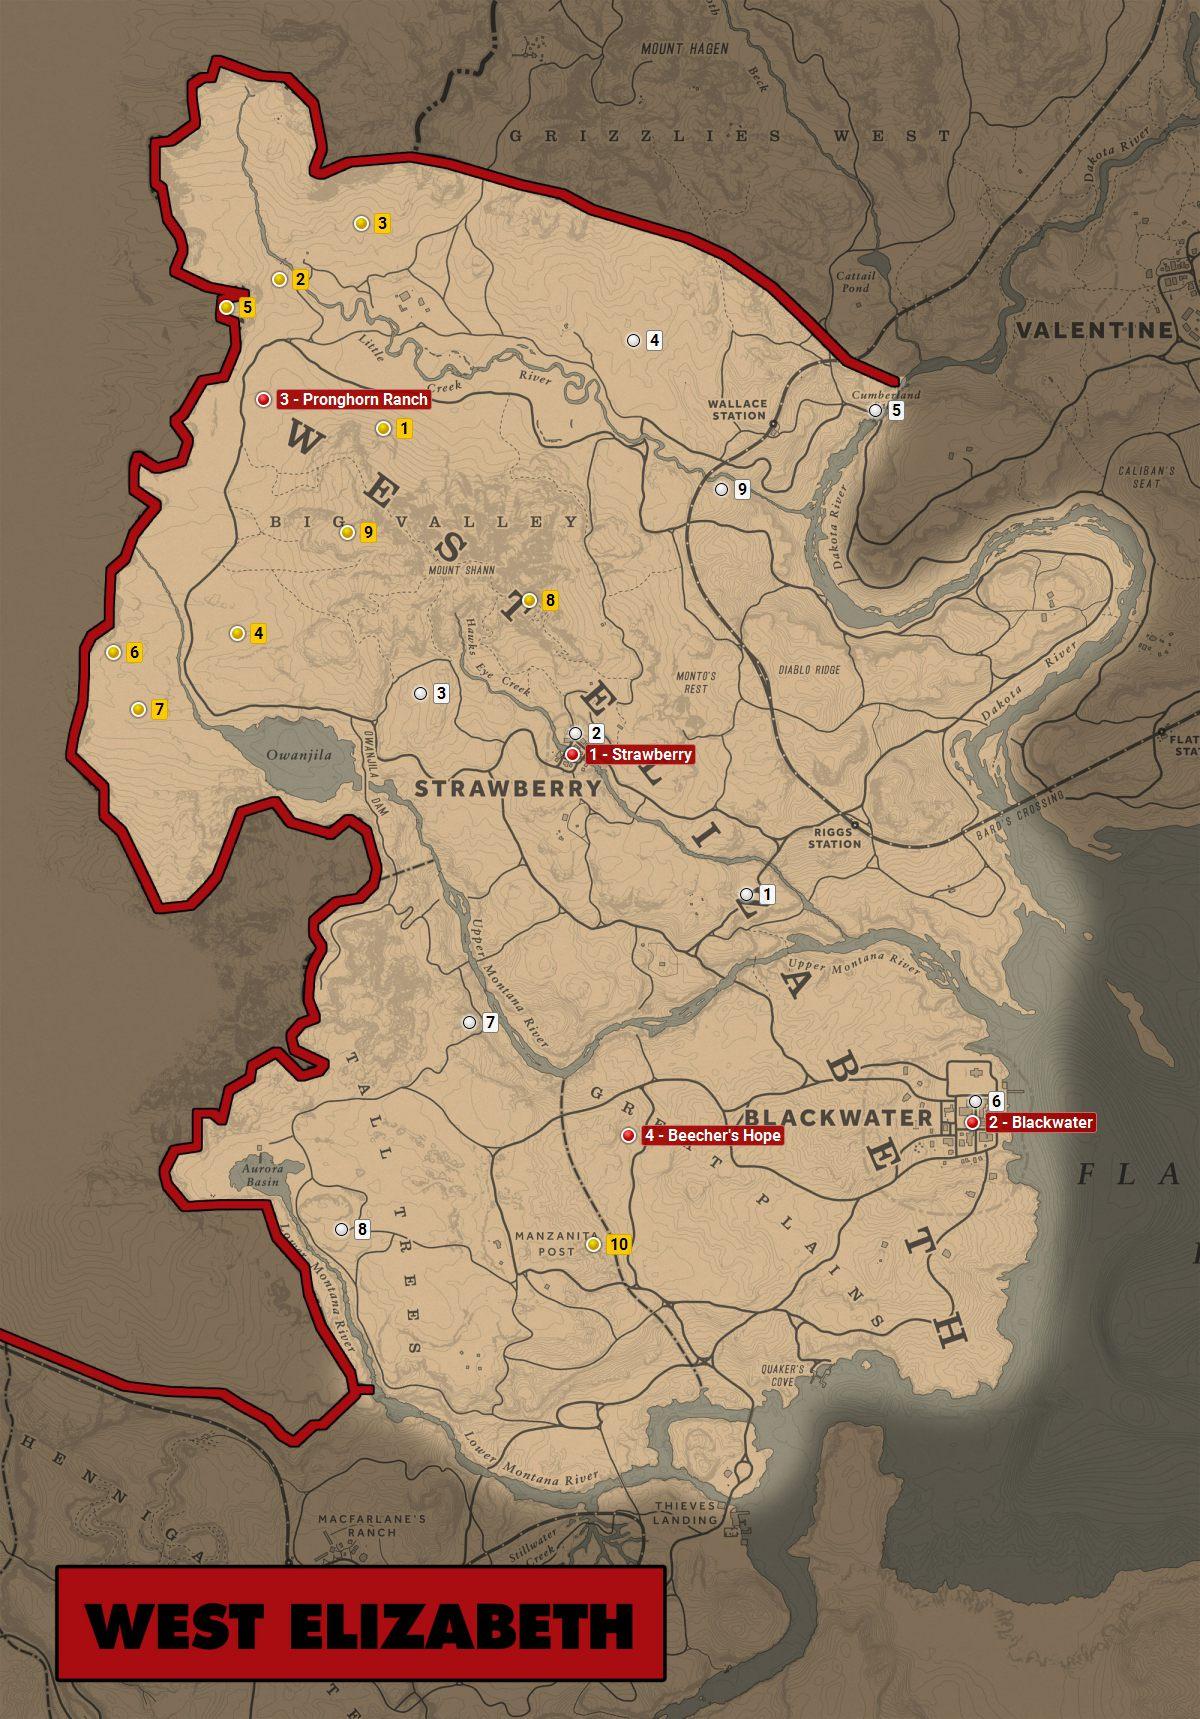 Red Dead 2 World Map.West Elizabeth Red Dead Redemption 2 World Atlas Map Red Dead